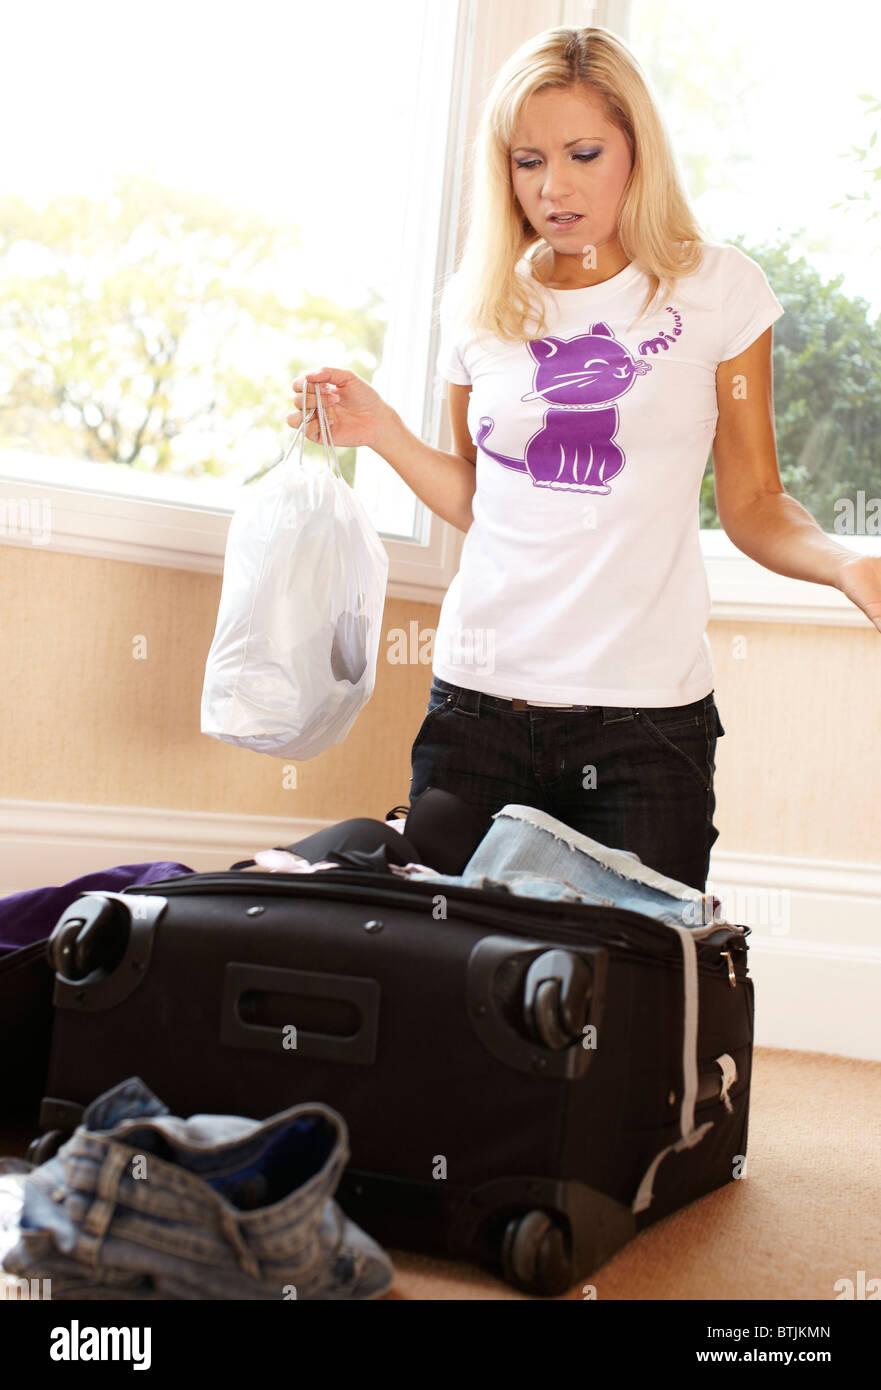 Niña maleta de embalaje Imagen De Stock